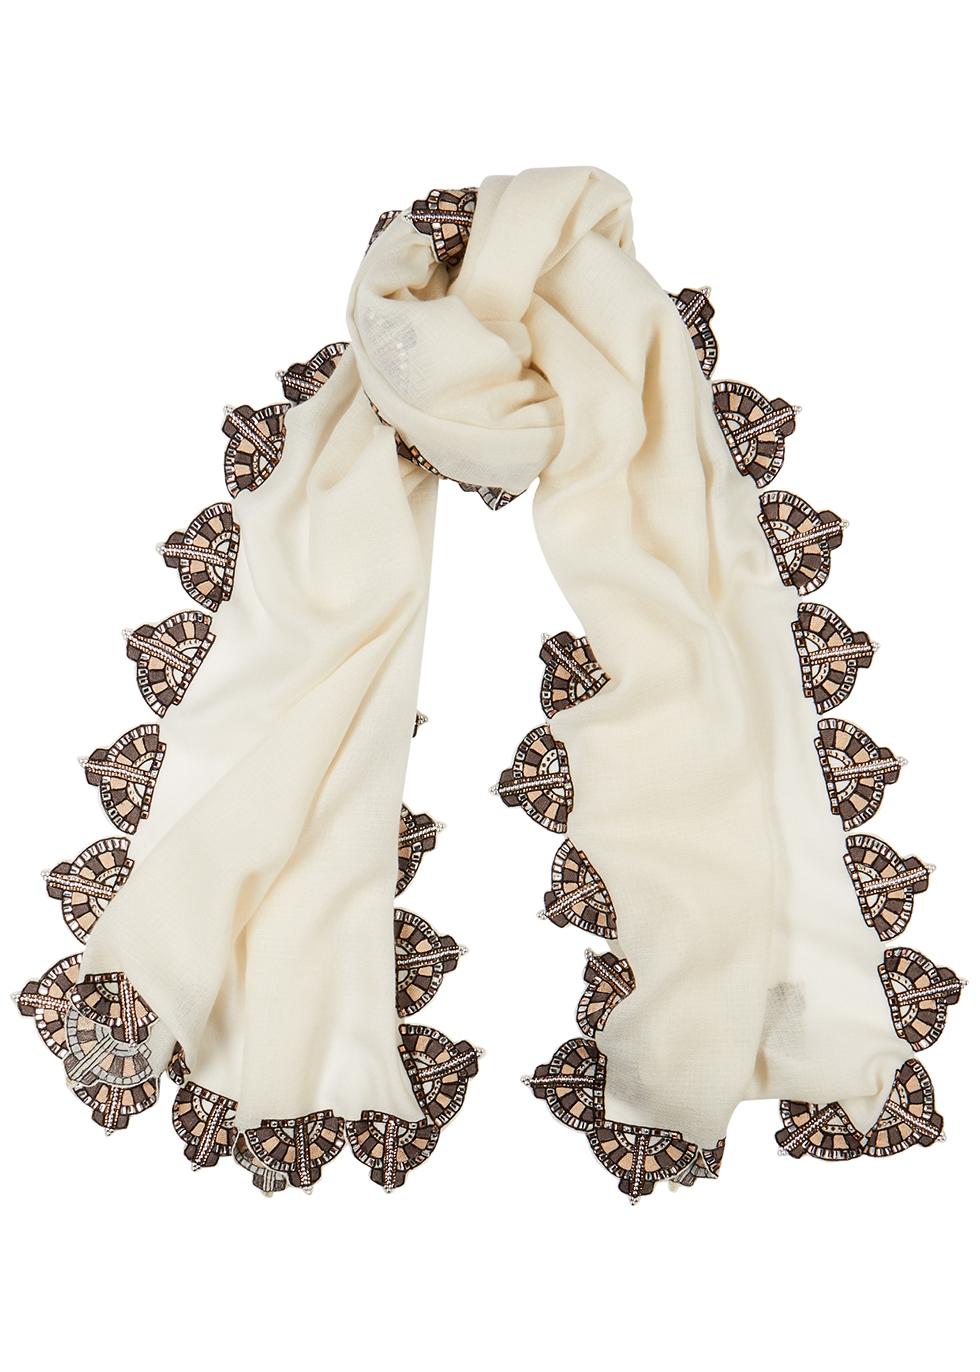 Betty Davis embellished cashmere scarf